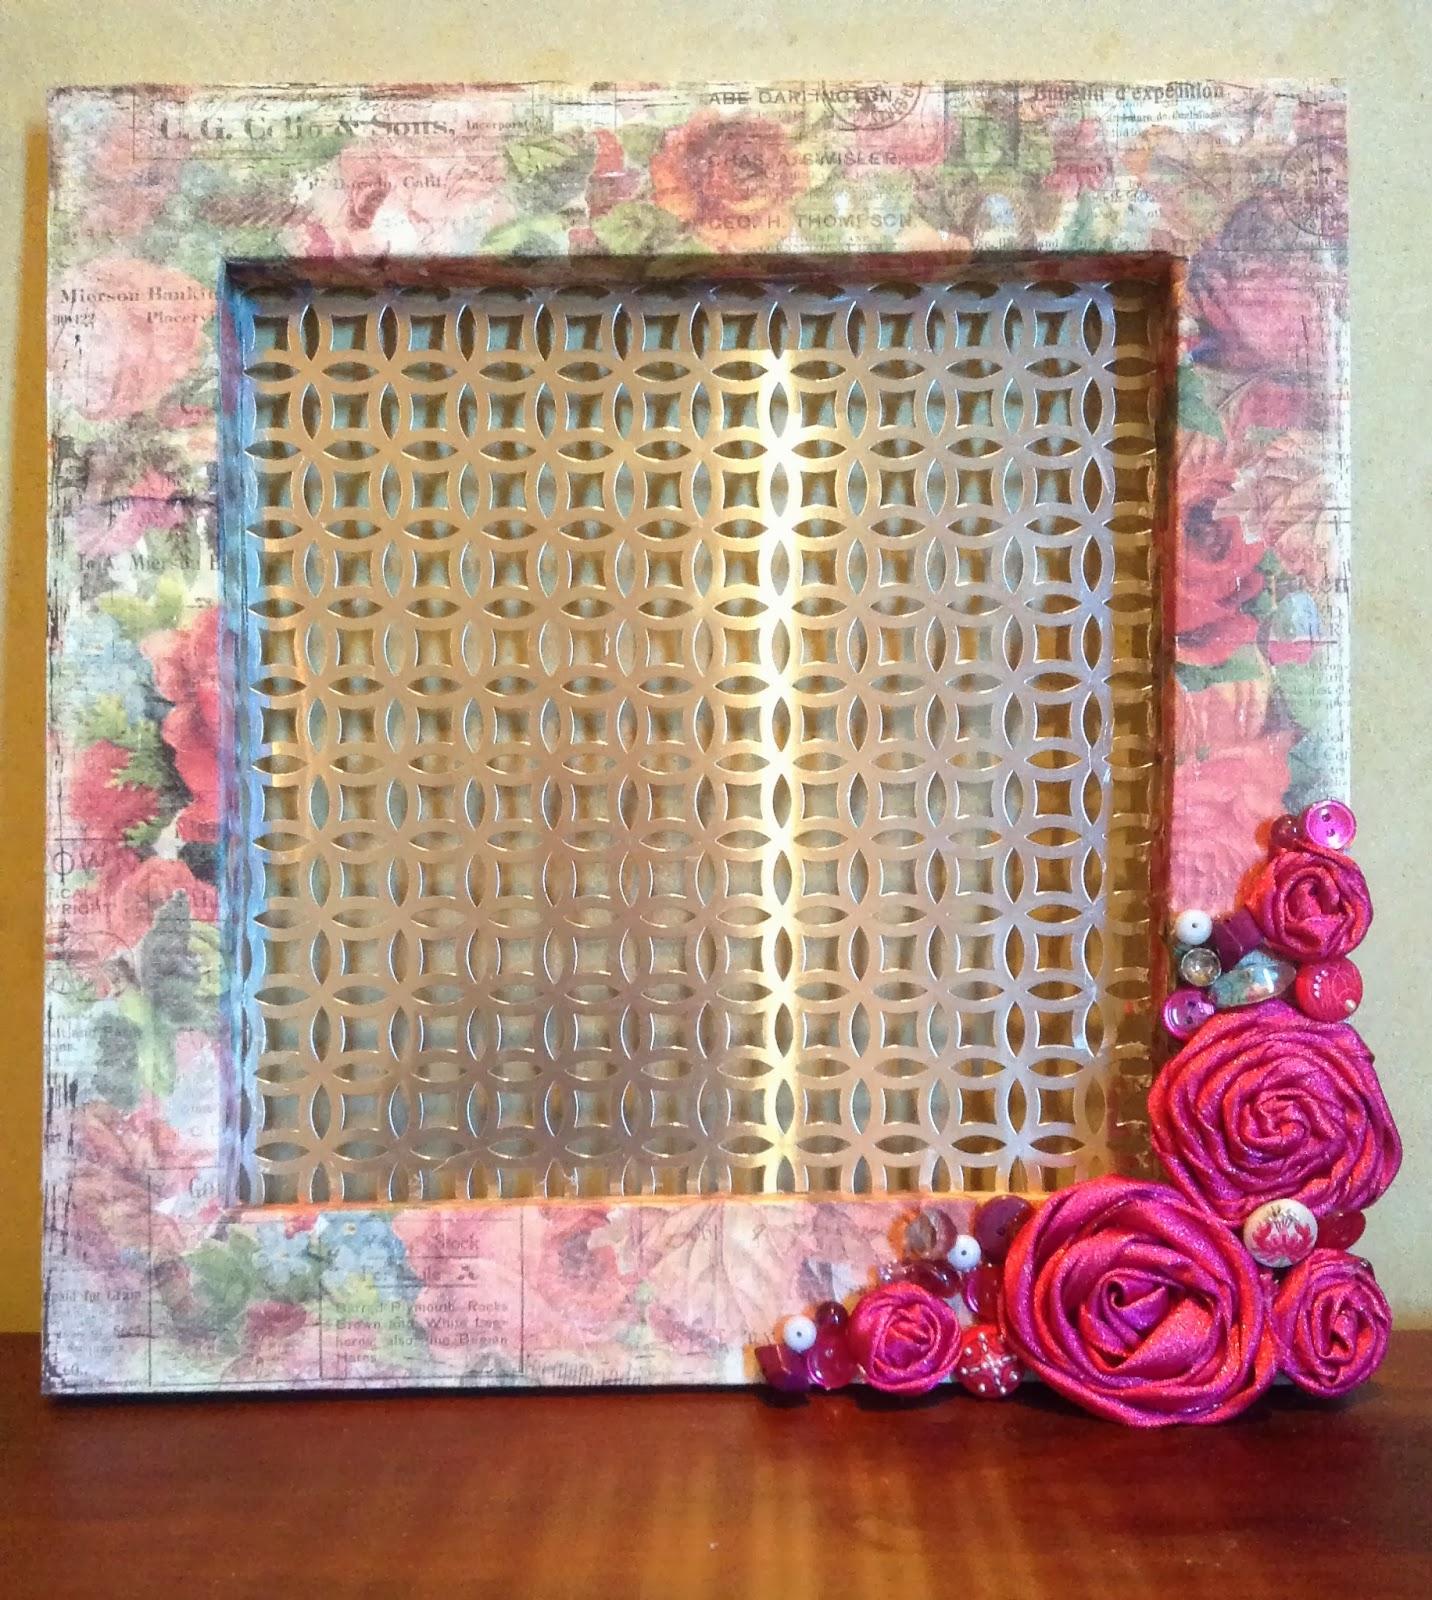 Make Your Own Jewellery Display Board: Willow Run Crafts' Blog: DIY Jewelry Display